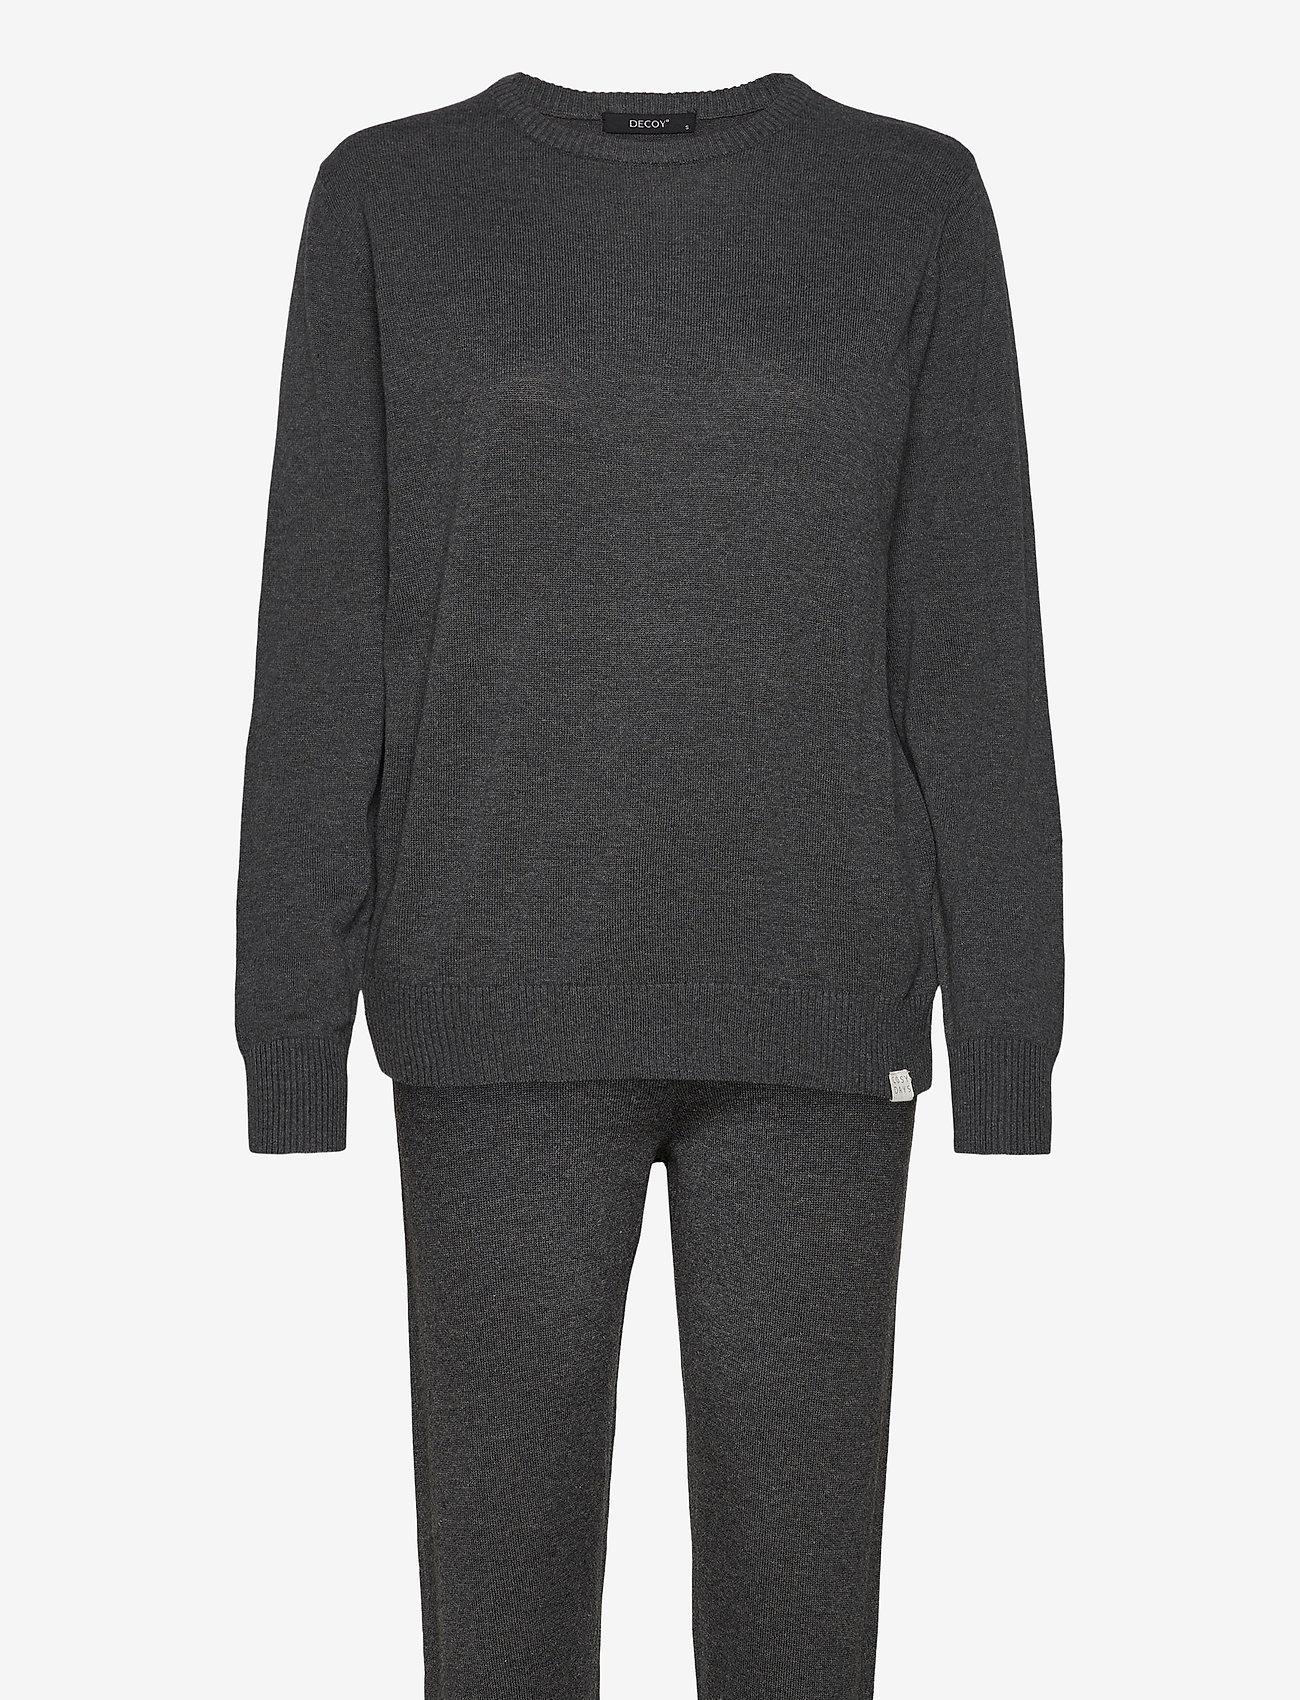 Decoy - DECOY knit set loungewear - pyjama''s - mörkgrå me - 0